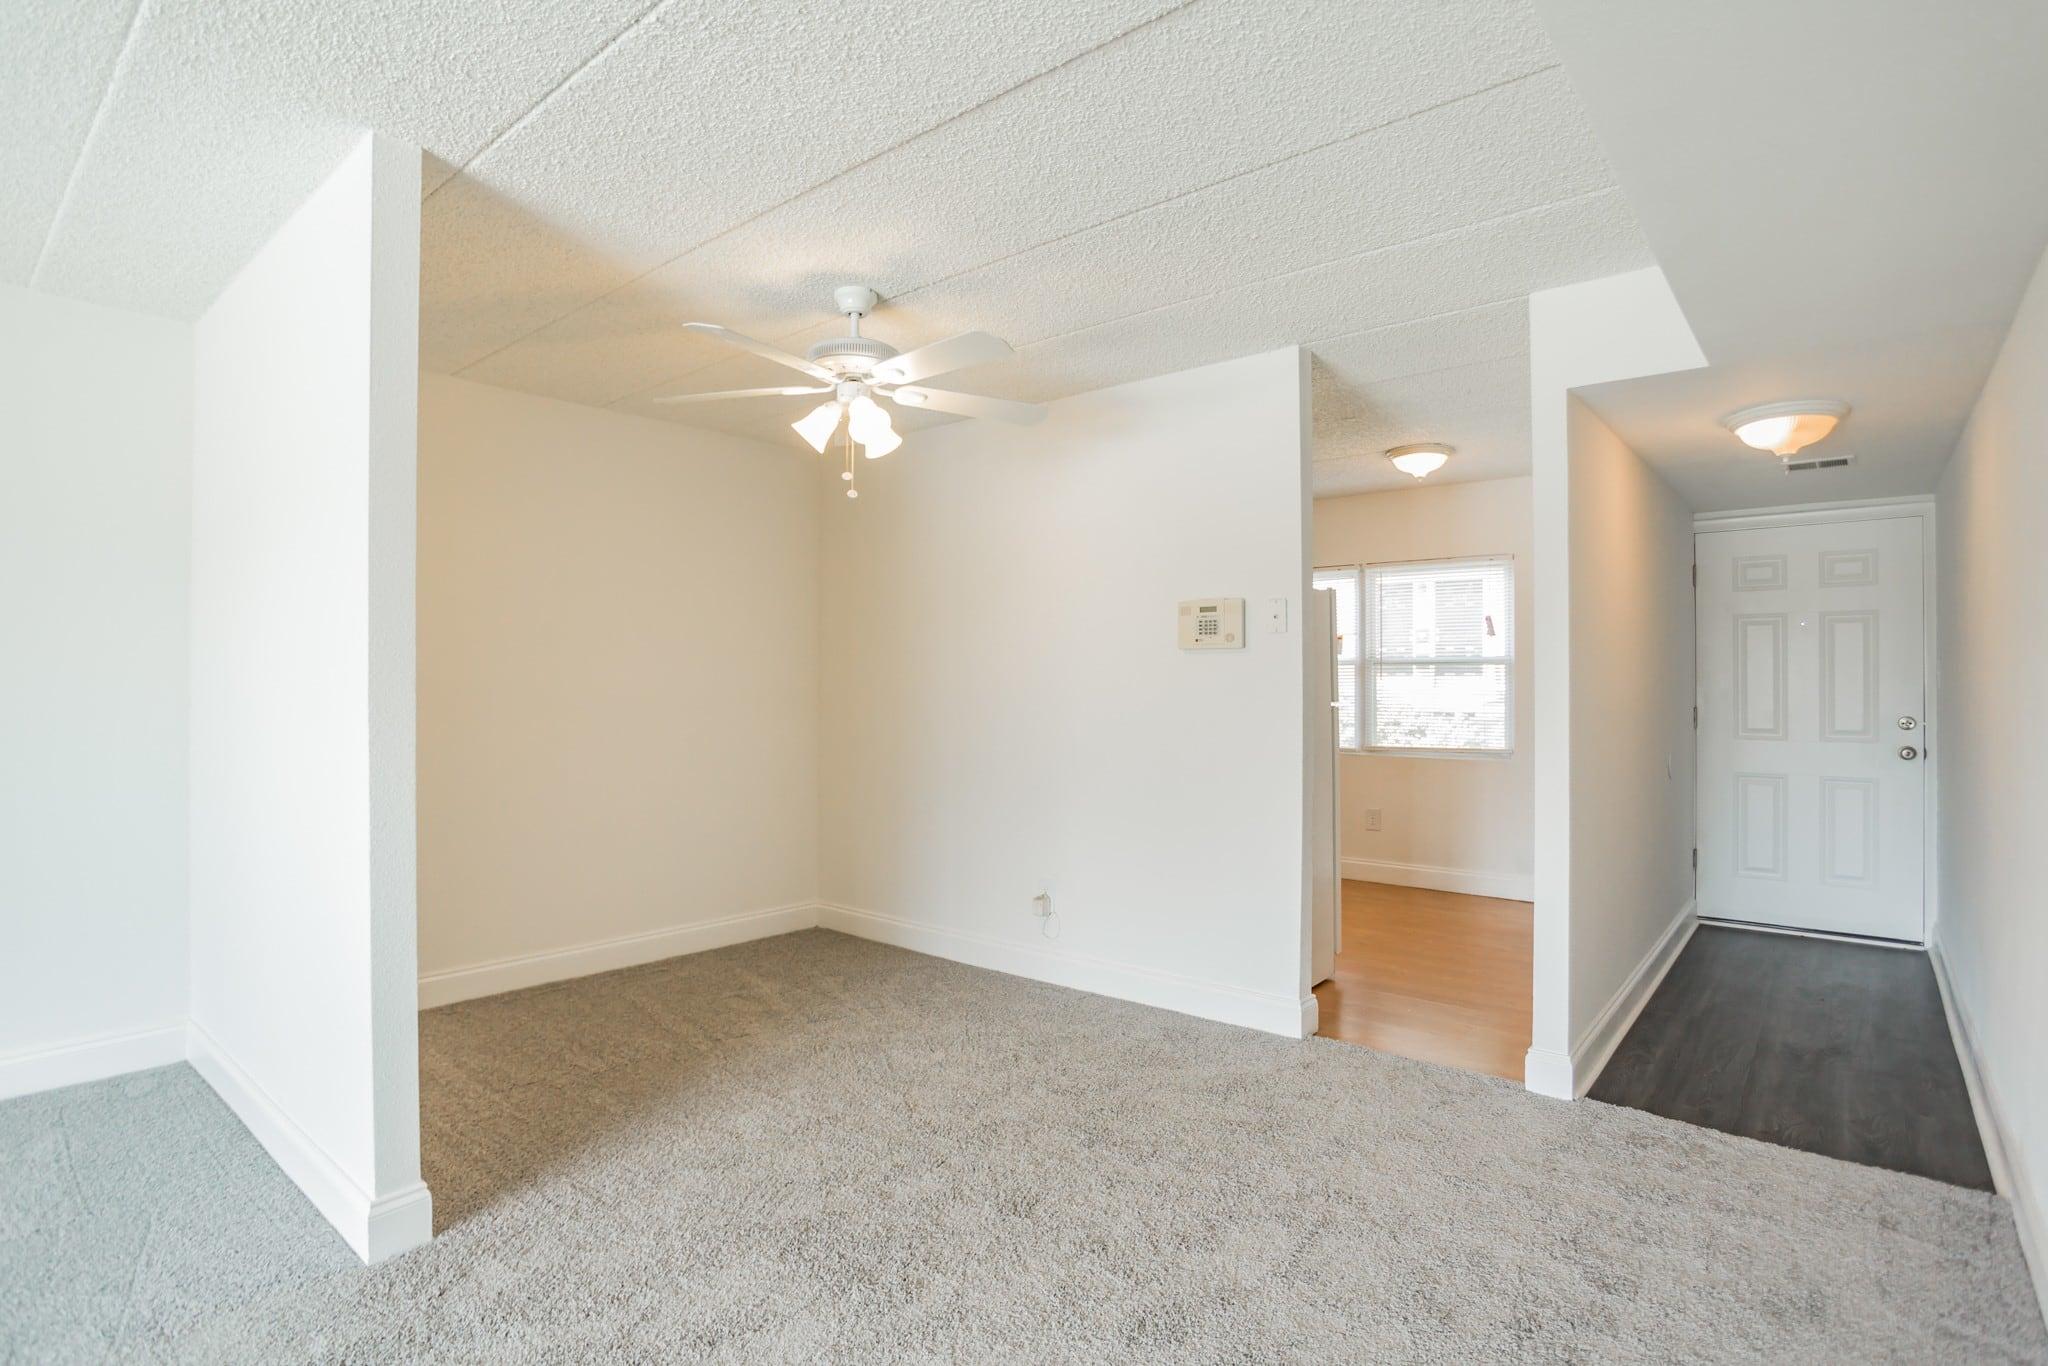 Interior view of Westgate Village Apartments  in Malvern, PA